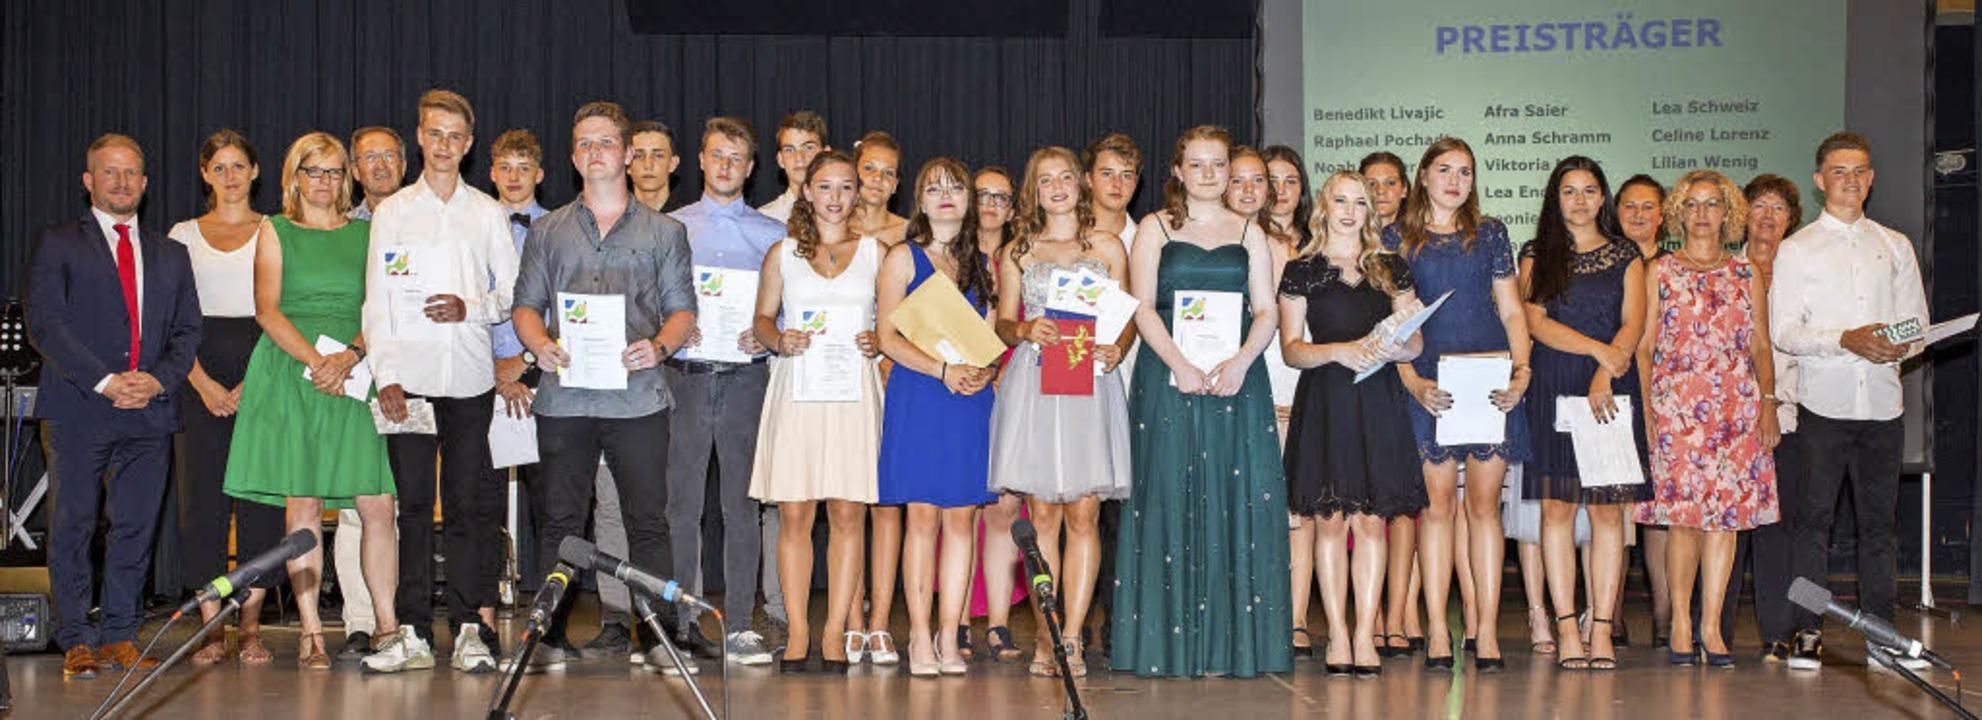 Die Preisträger des Abschlussjahrgangs...ealschule am Giersberg in Kirchzarten     Foto: Thomas Steuber